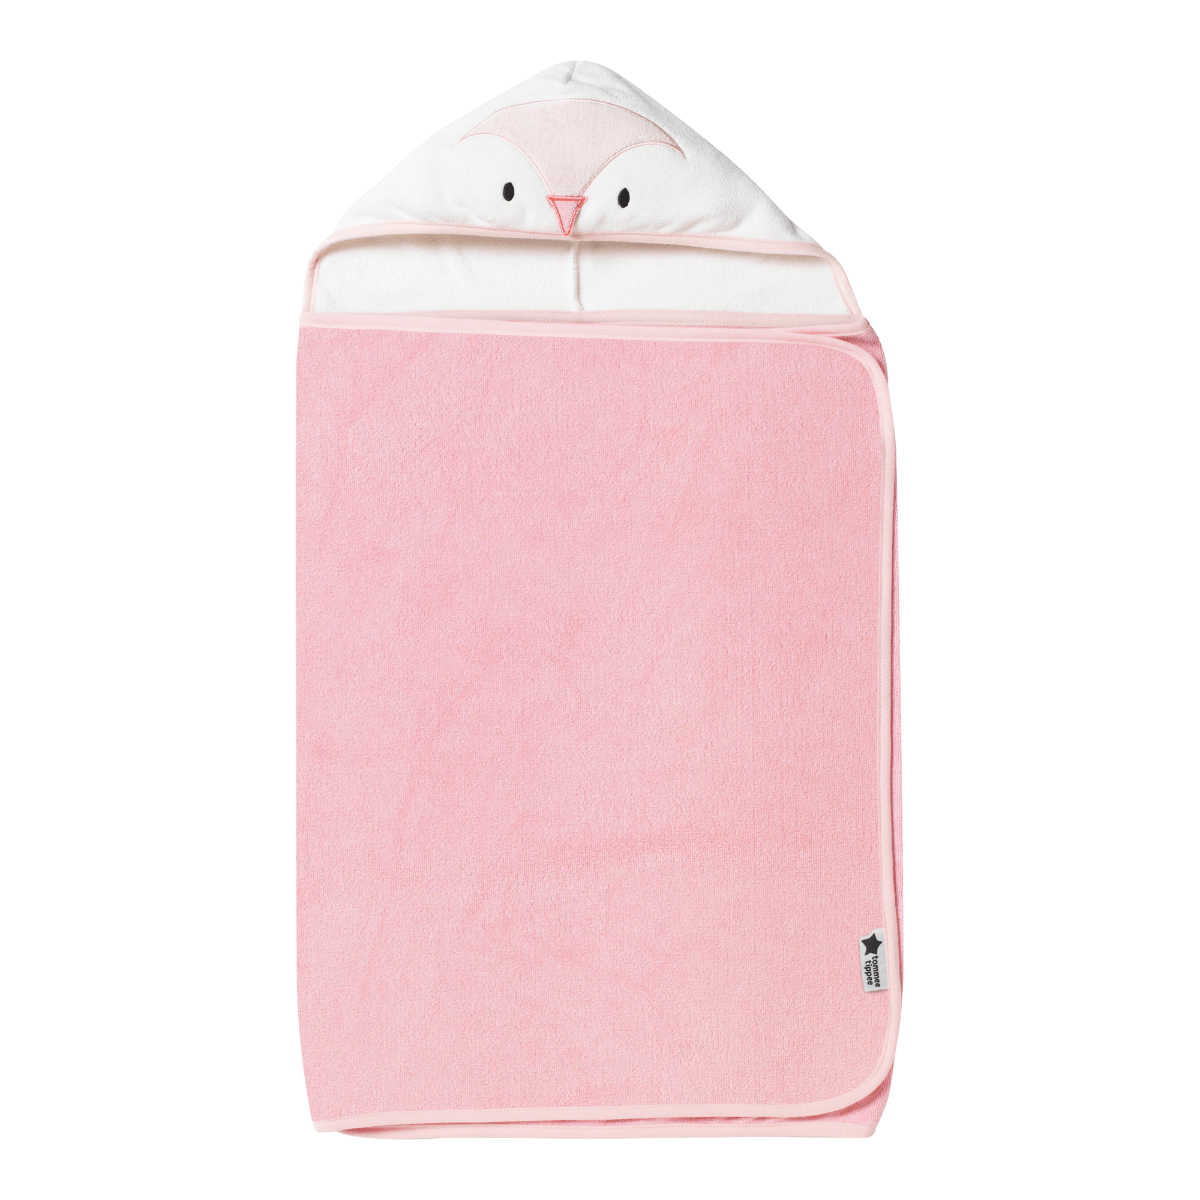 Osuška s kapucňou Hug 'n' Dry 6-48m Penny Pink